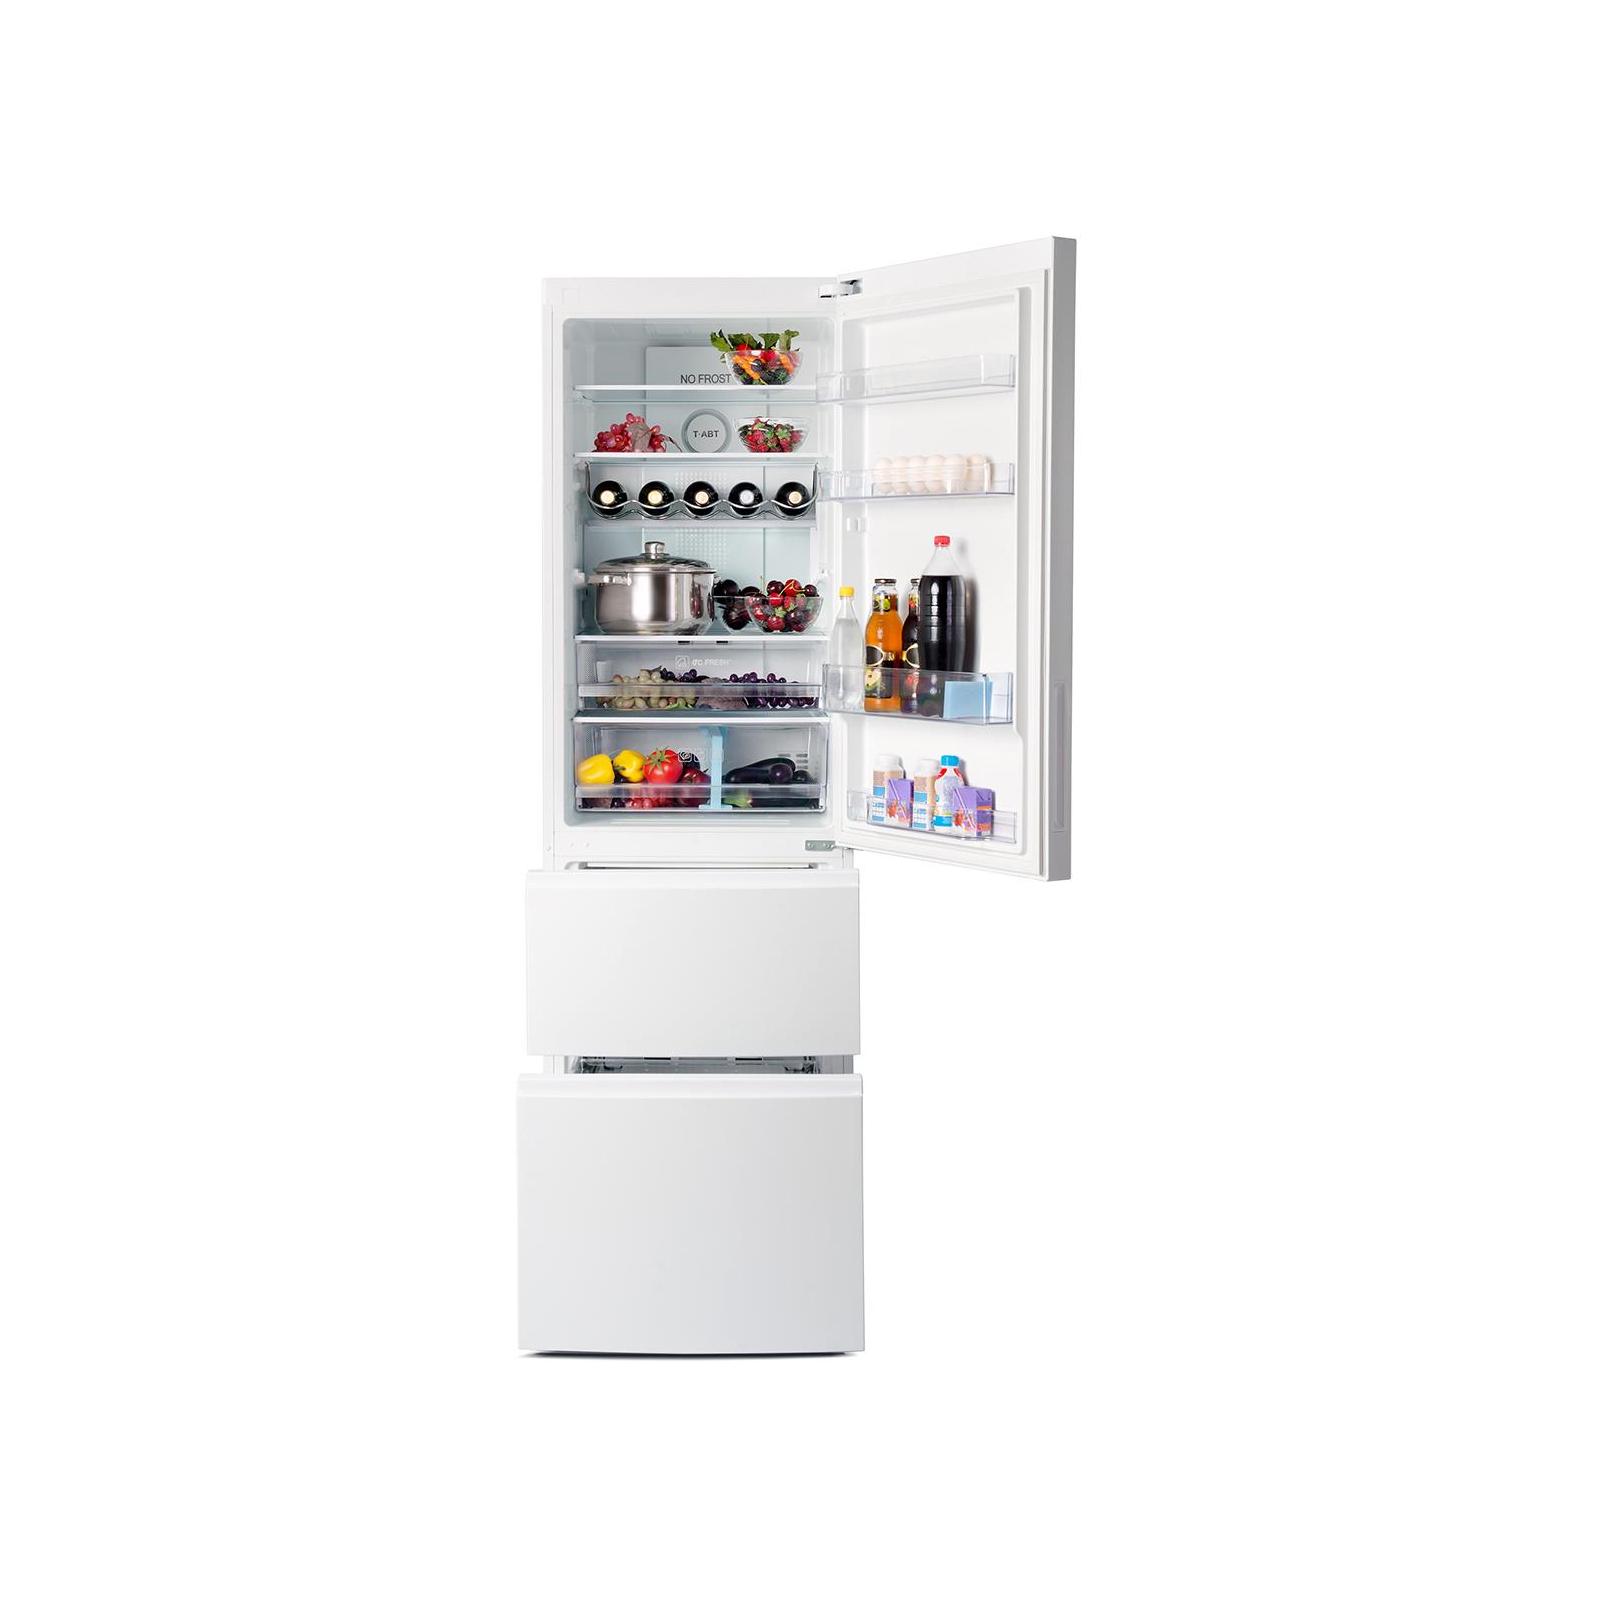 Холодильник Haier HA A2F635CWMV изображение 5